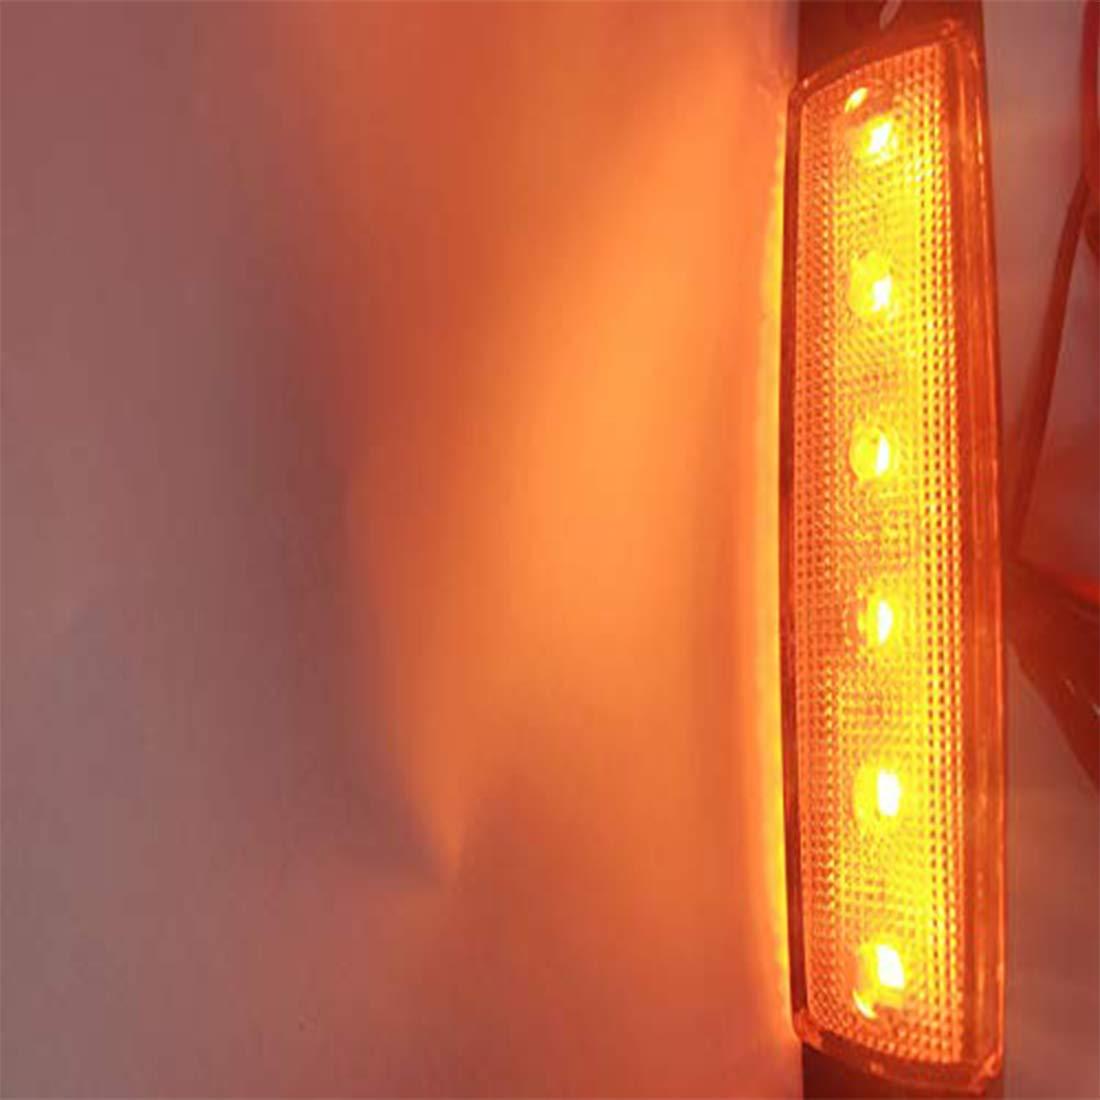 RV Marker light amber Led Marker Lights for Trucks NBWDY 10pc 3.8 6 LED amber Side Marker Lights Rear Side Marker Lamp Amber Cab Marker amber Trailer Marker Lights